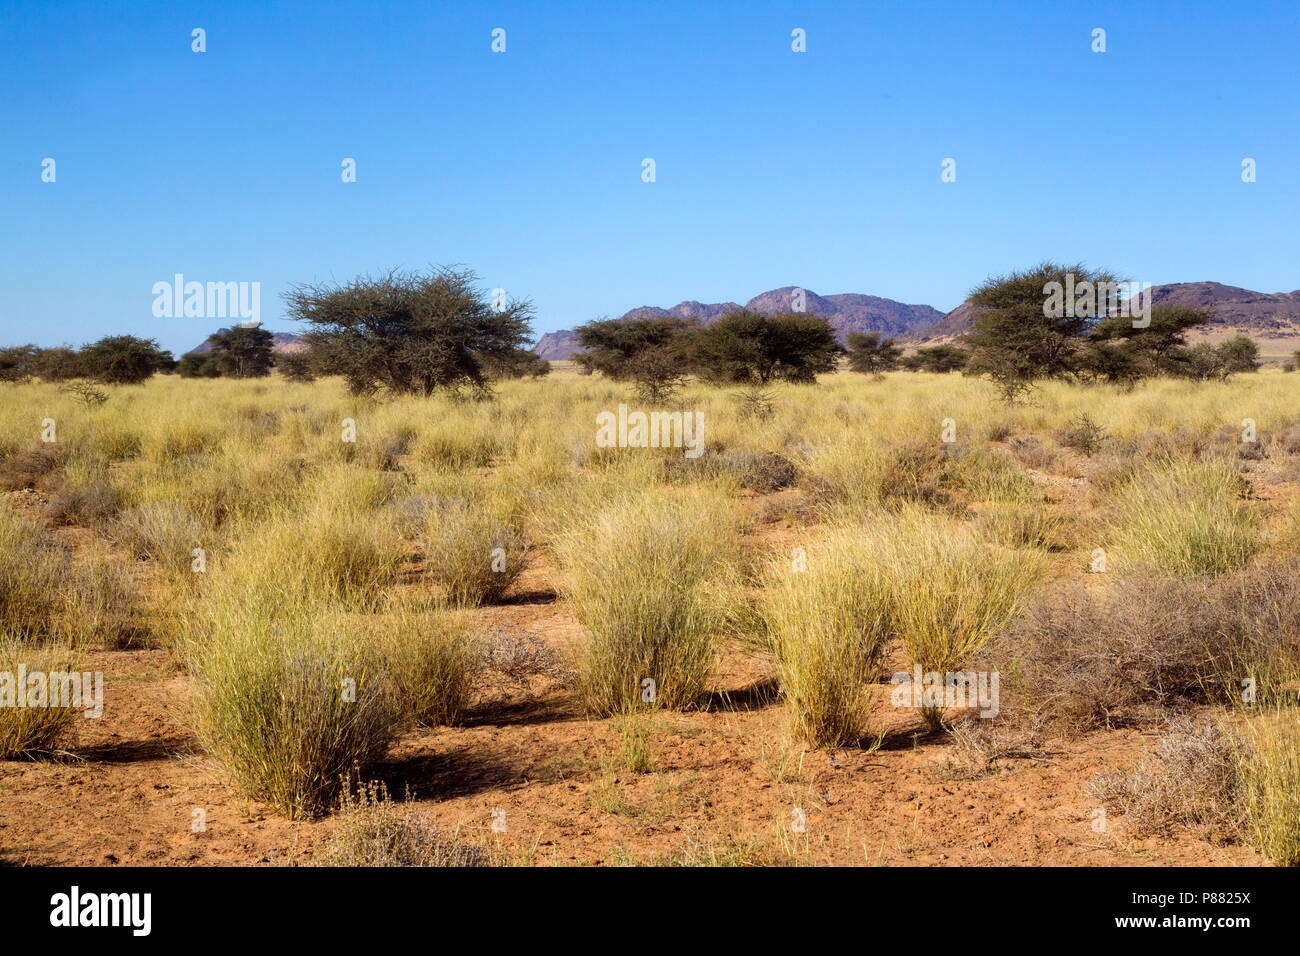 Landschap, Oued Jenna, Aousserd, Landscape, Oued Jenna, Aousserd - Stock Image